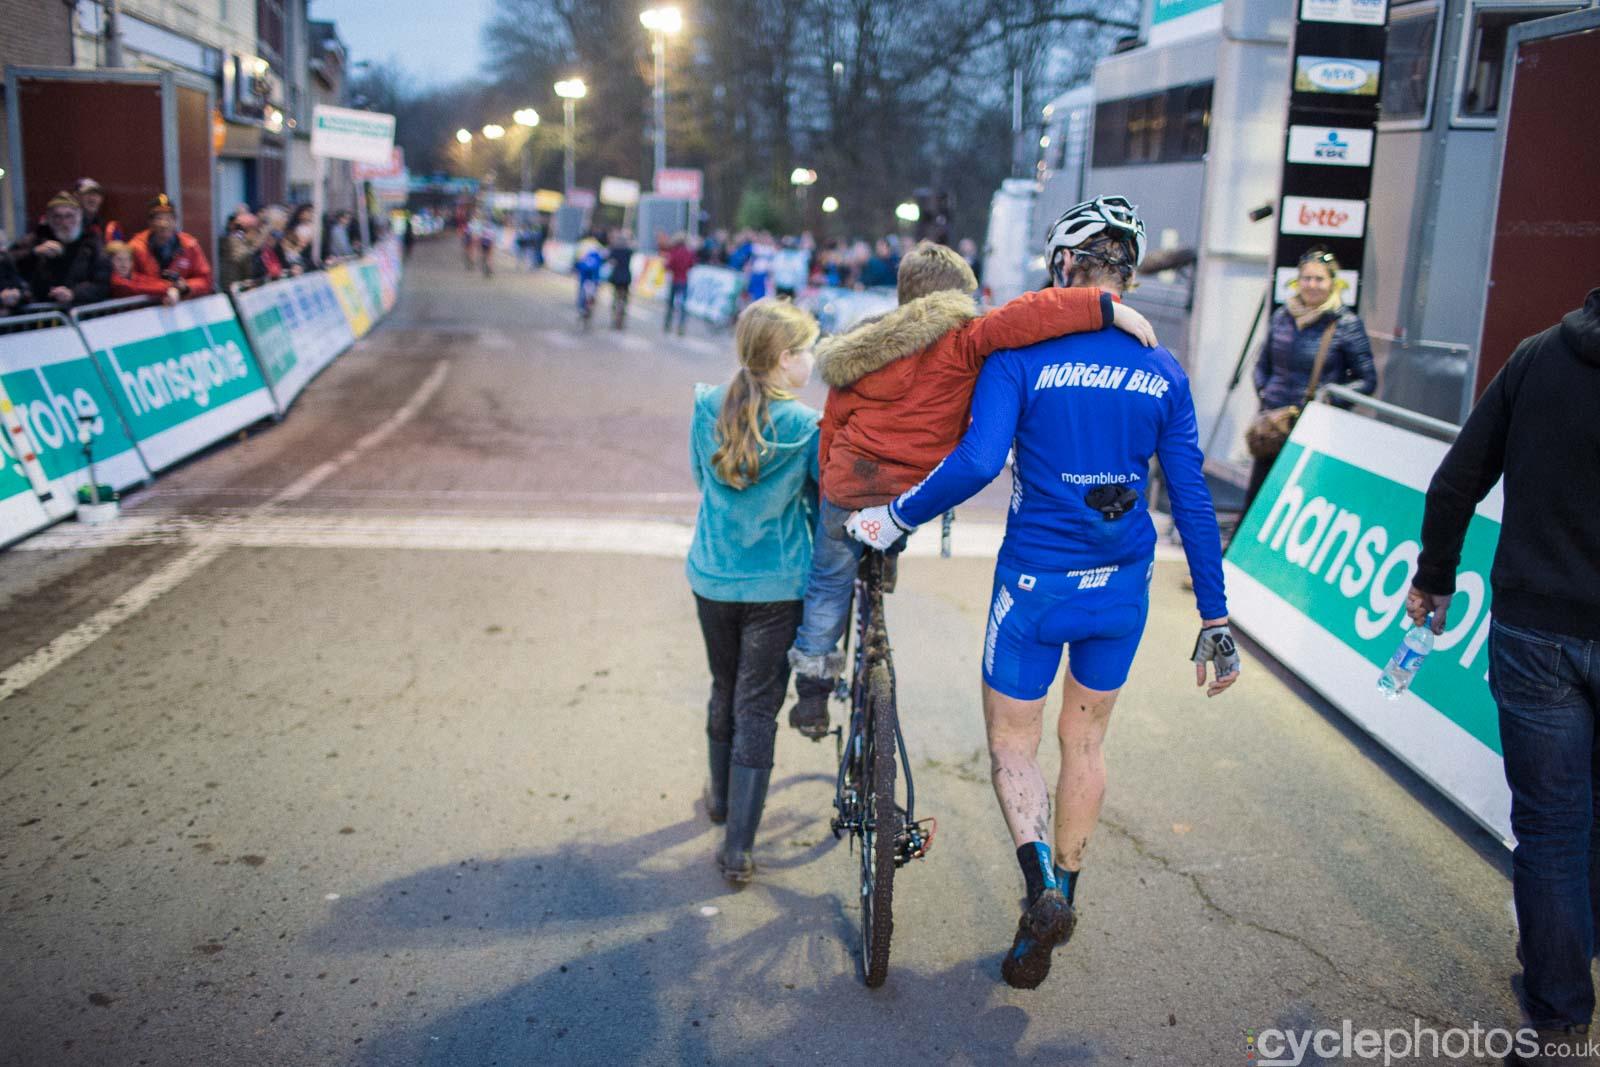 2015-cyclephotos-cyclocross-diegem-162422-bike